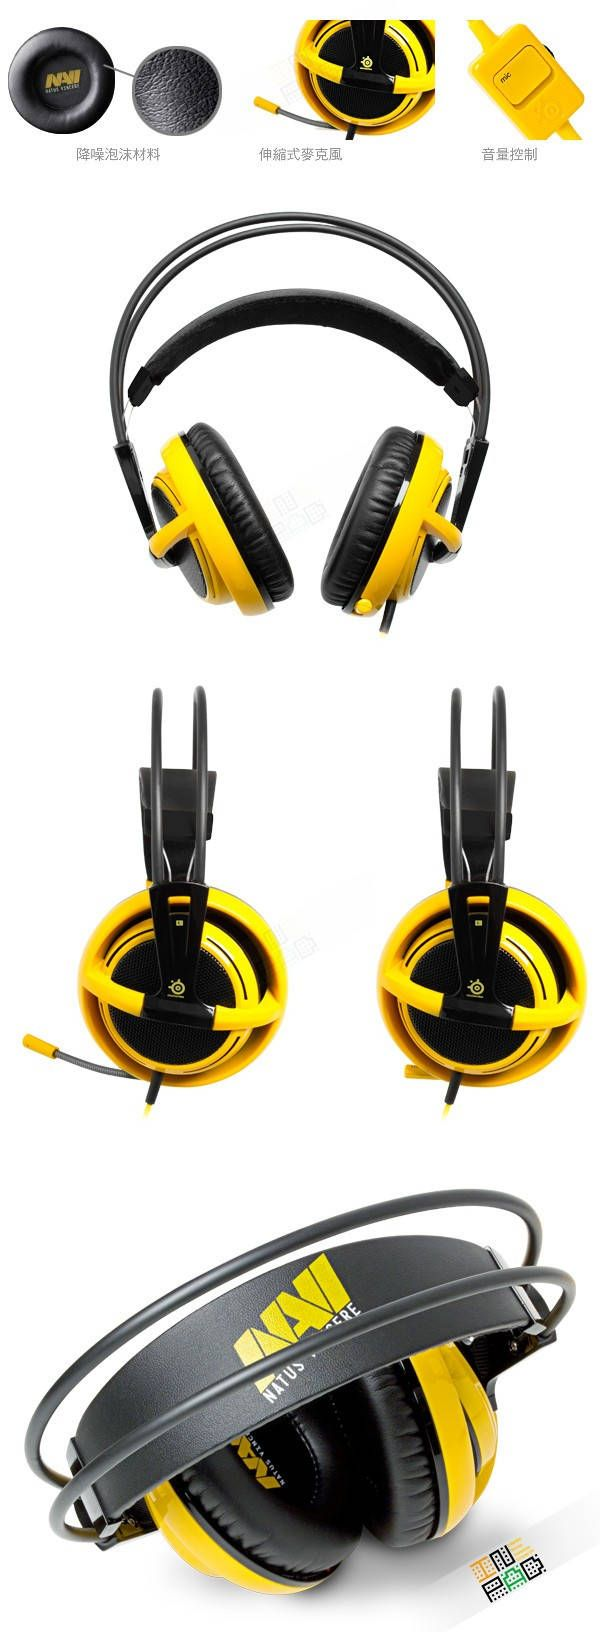 Steelseries 西伯利亞V2 耳機麥克風 黃色 NAVI特別版